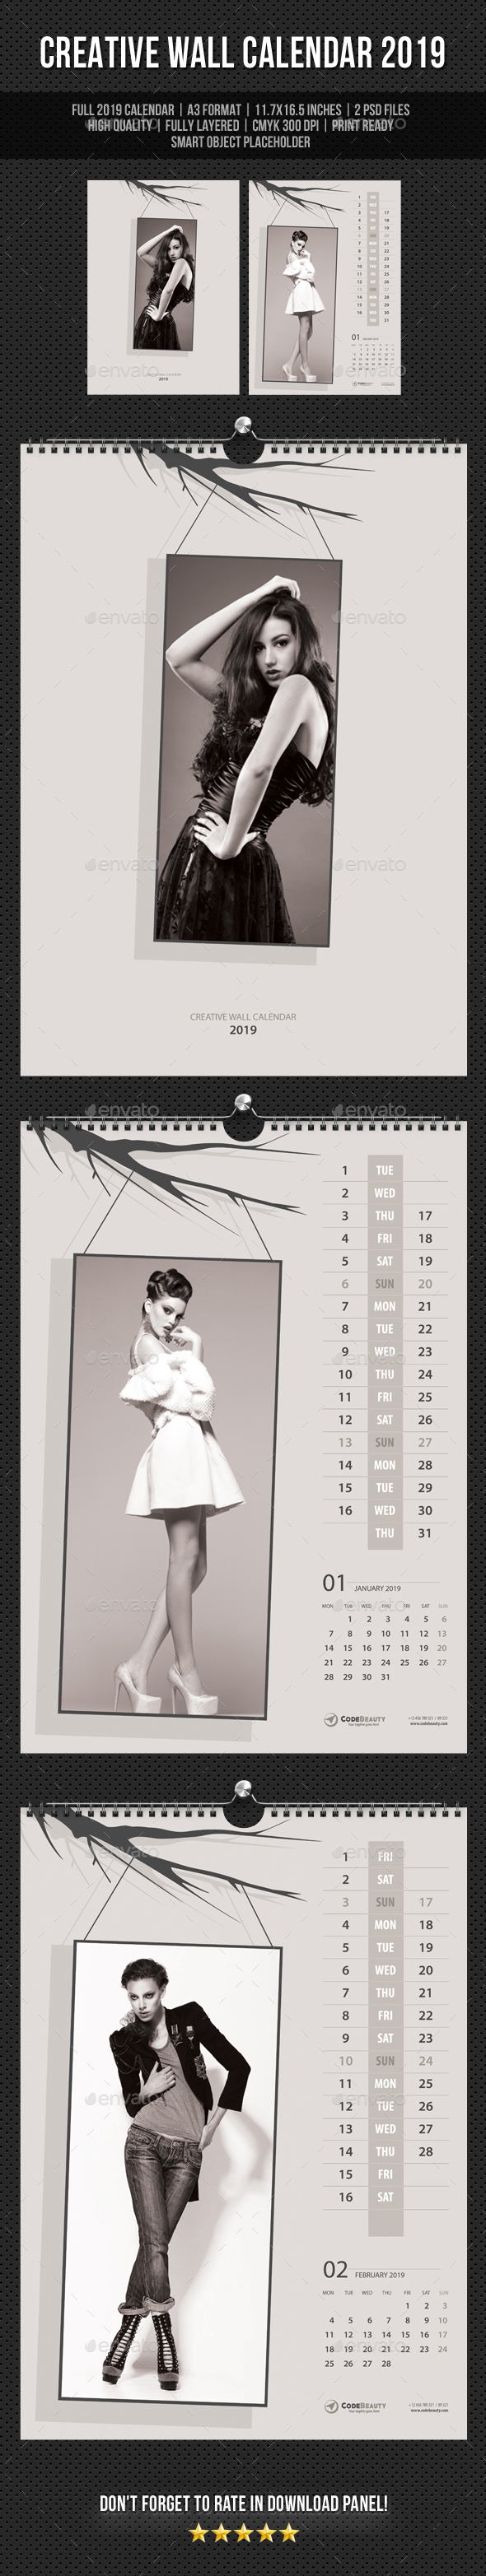 Creative Wall Calendar 2019 V17 - Calendars Stationery